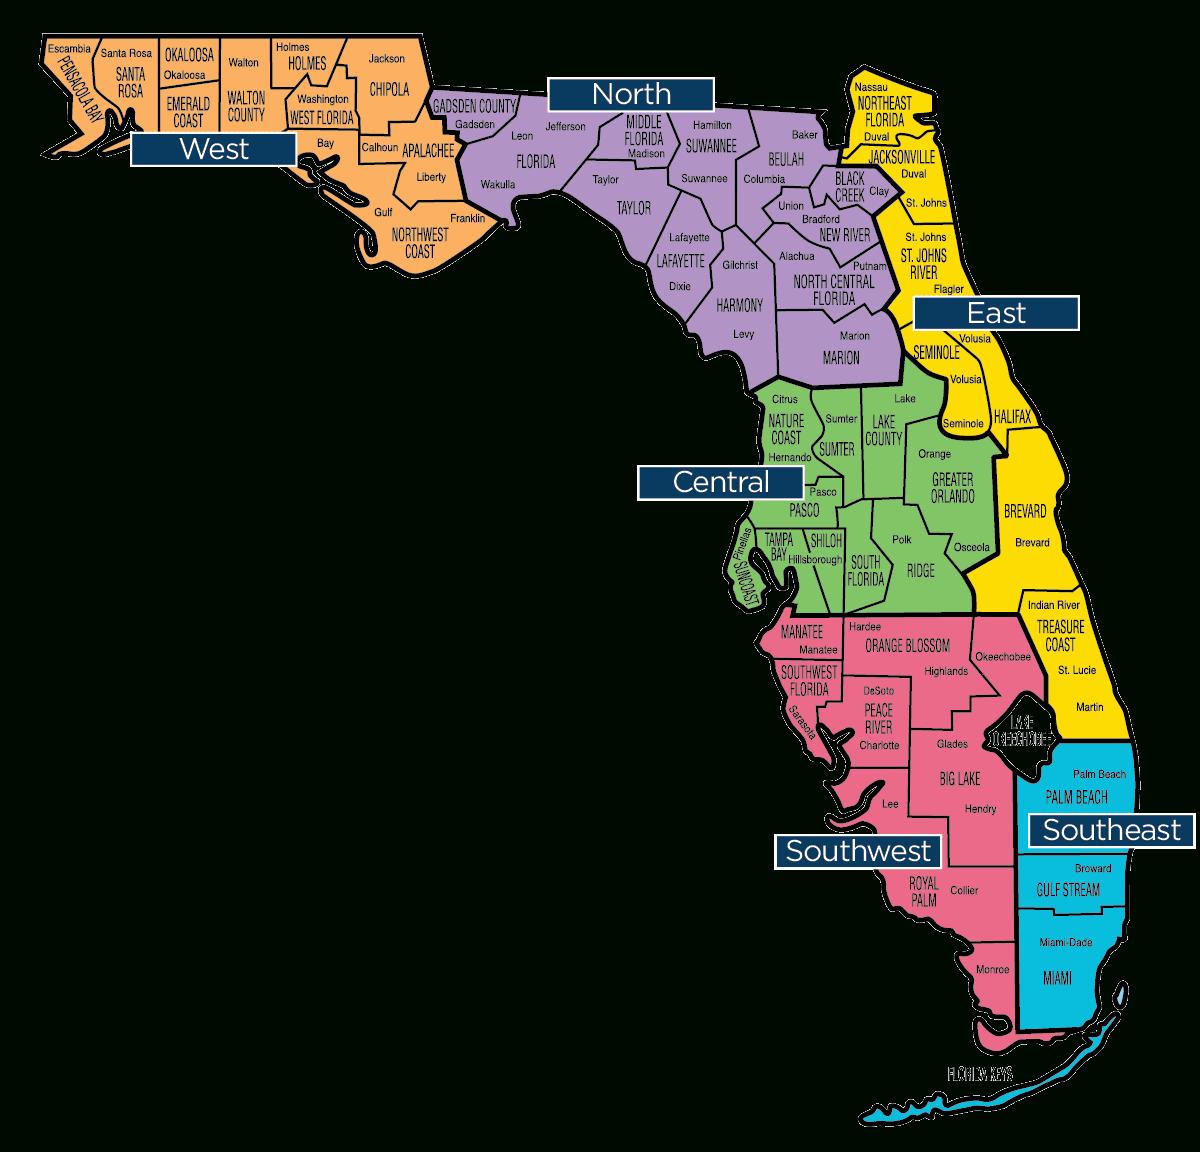 Florida Map - Florida Baptist Convention | Fbc - Orange Lake Florida Map